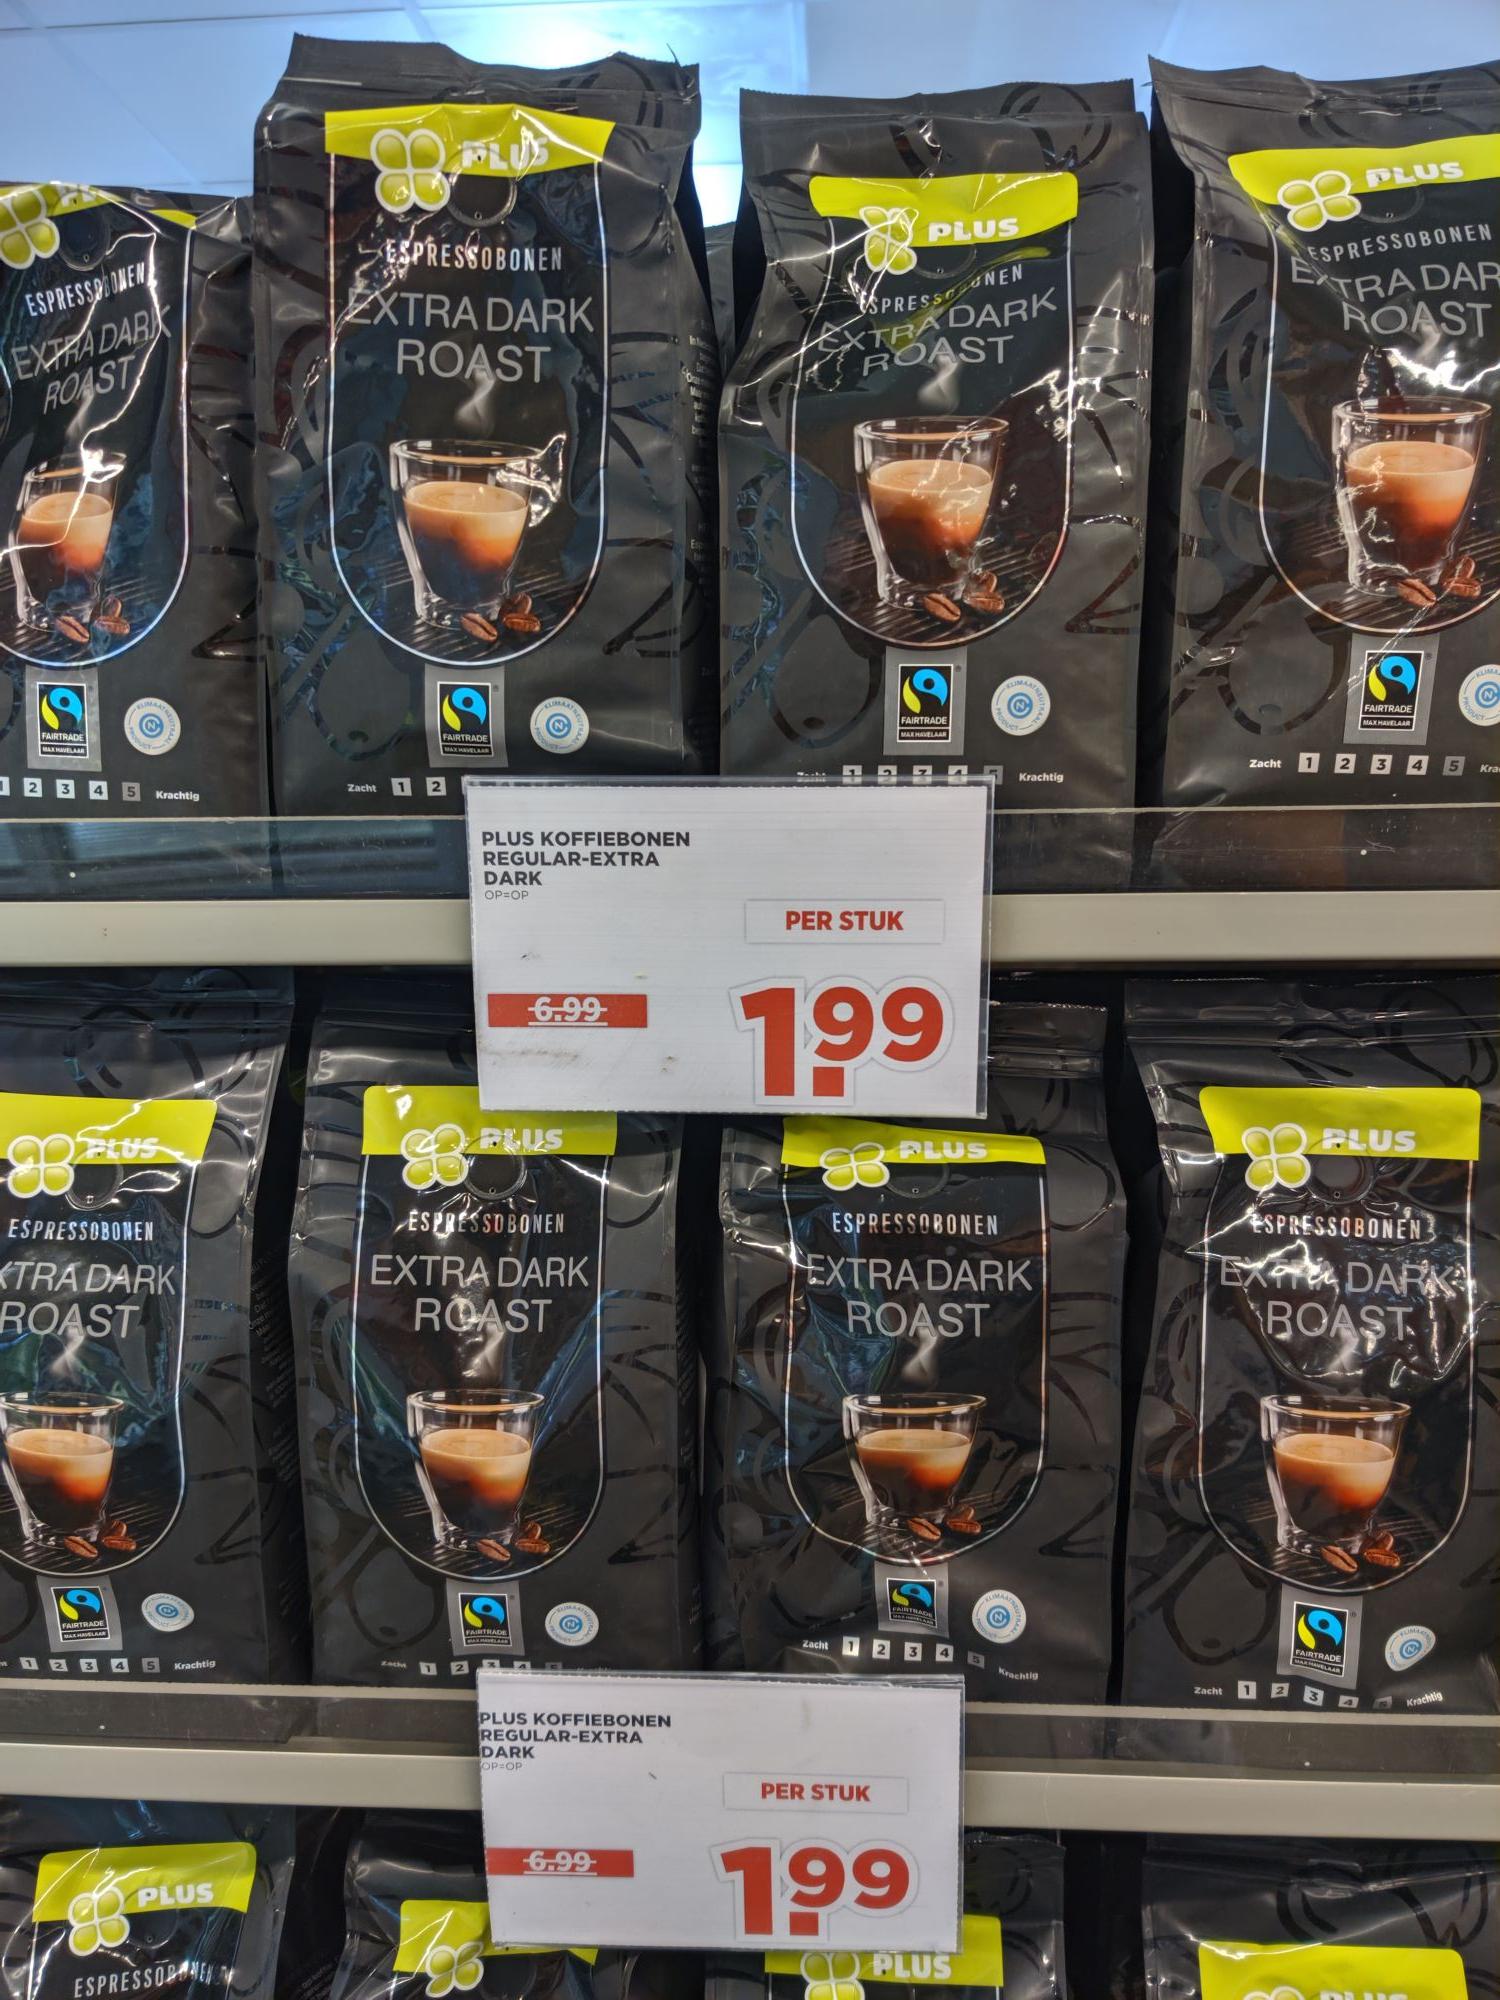 [LOKAAL BOCHOLTZ] Plus koffiebonen fairtrade en 100 procent arrabica.